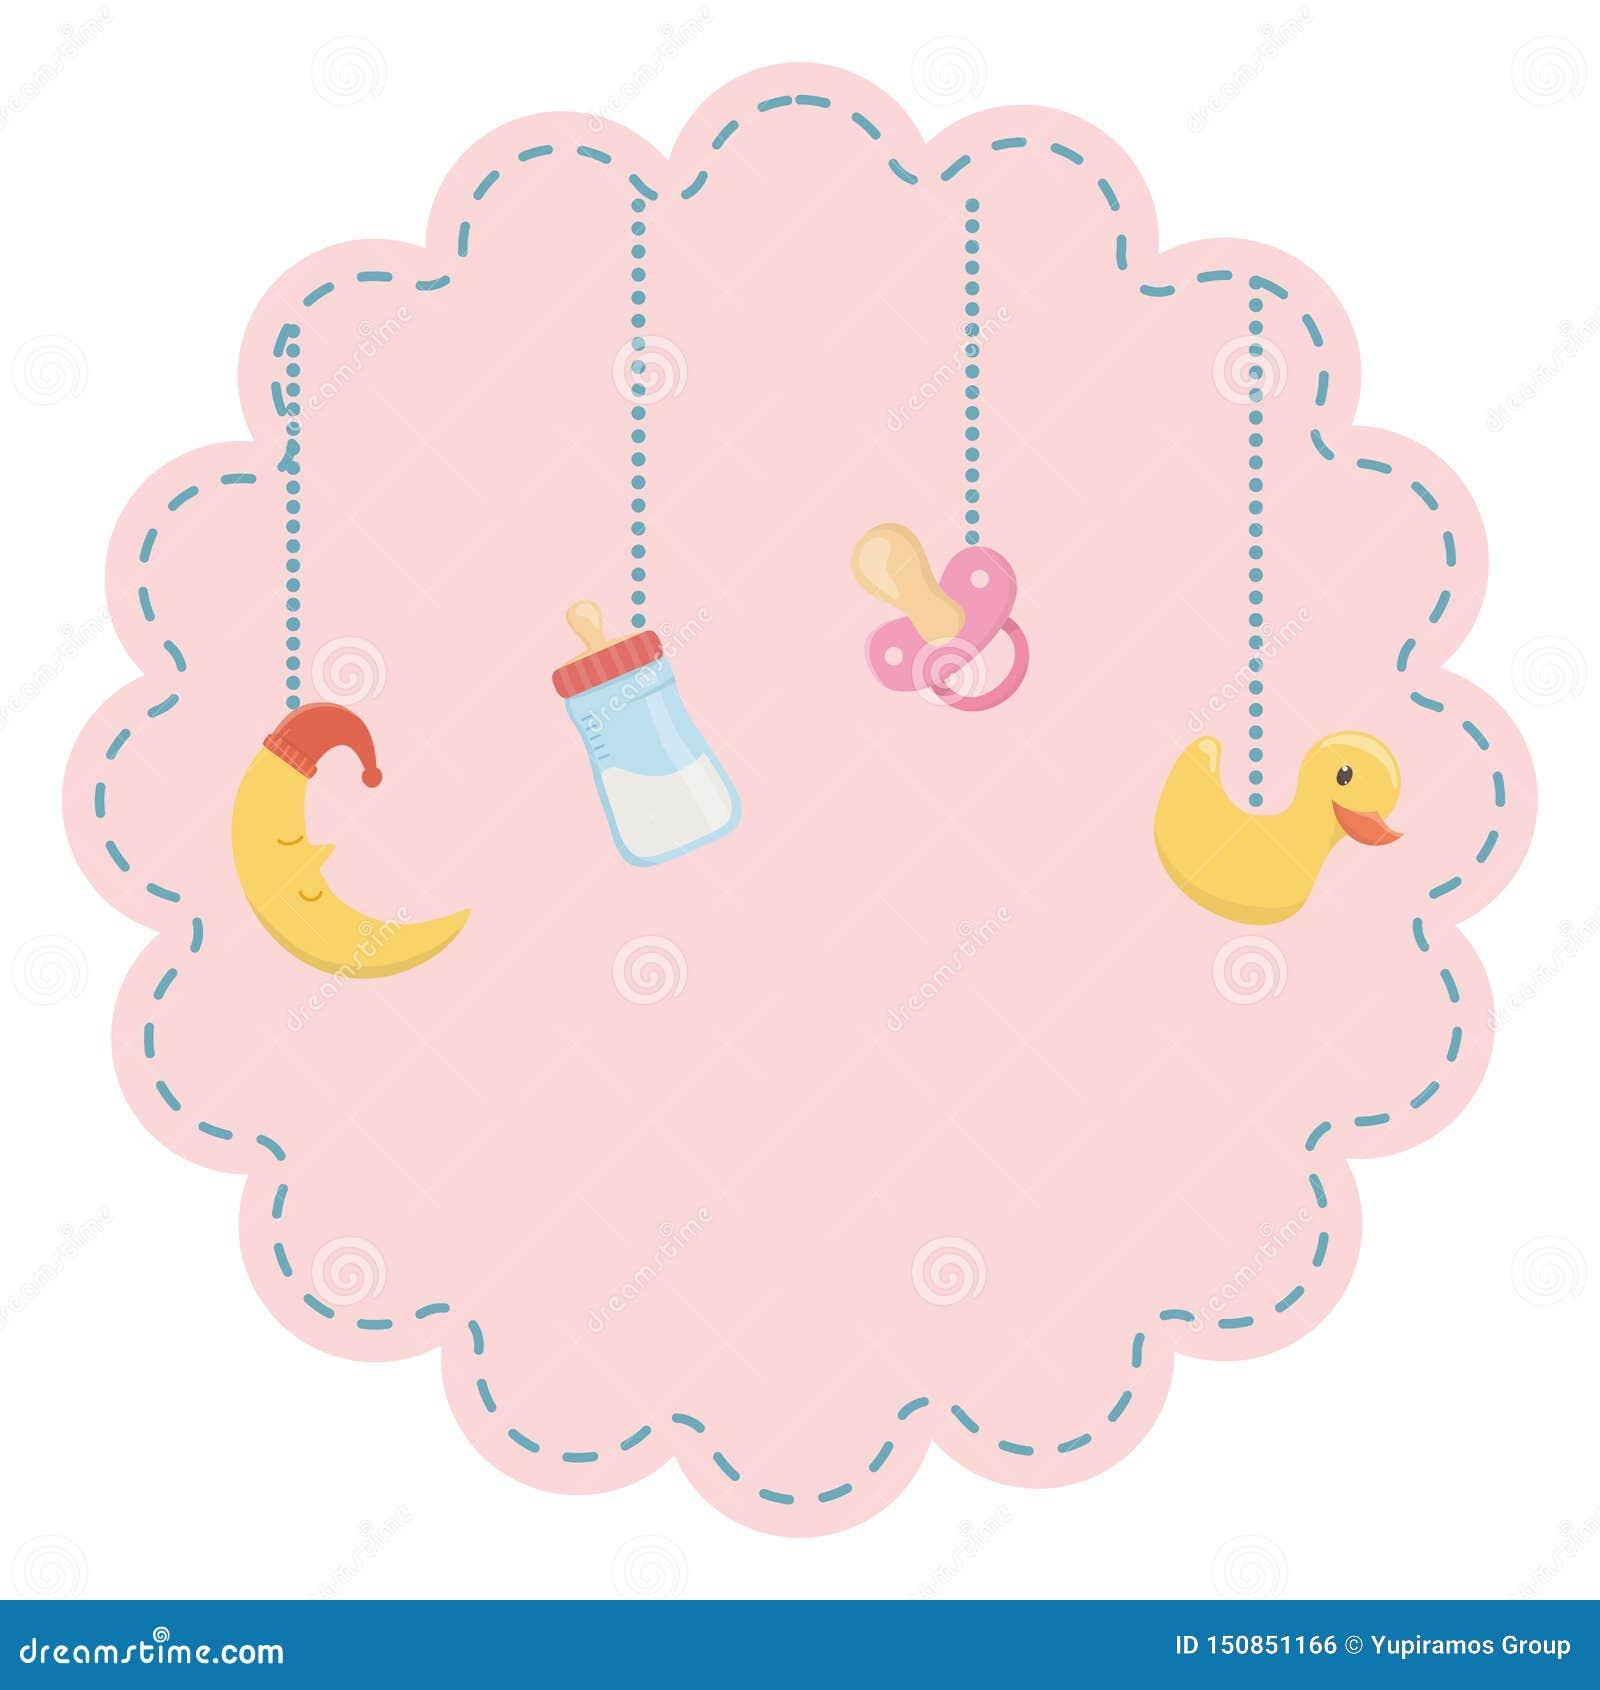 Baby shower symbol design vector illustration